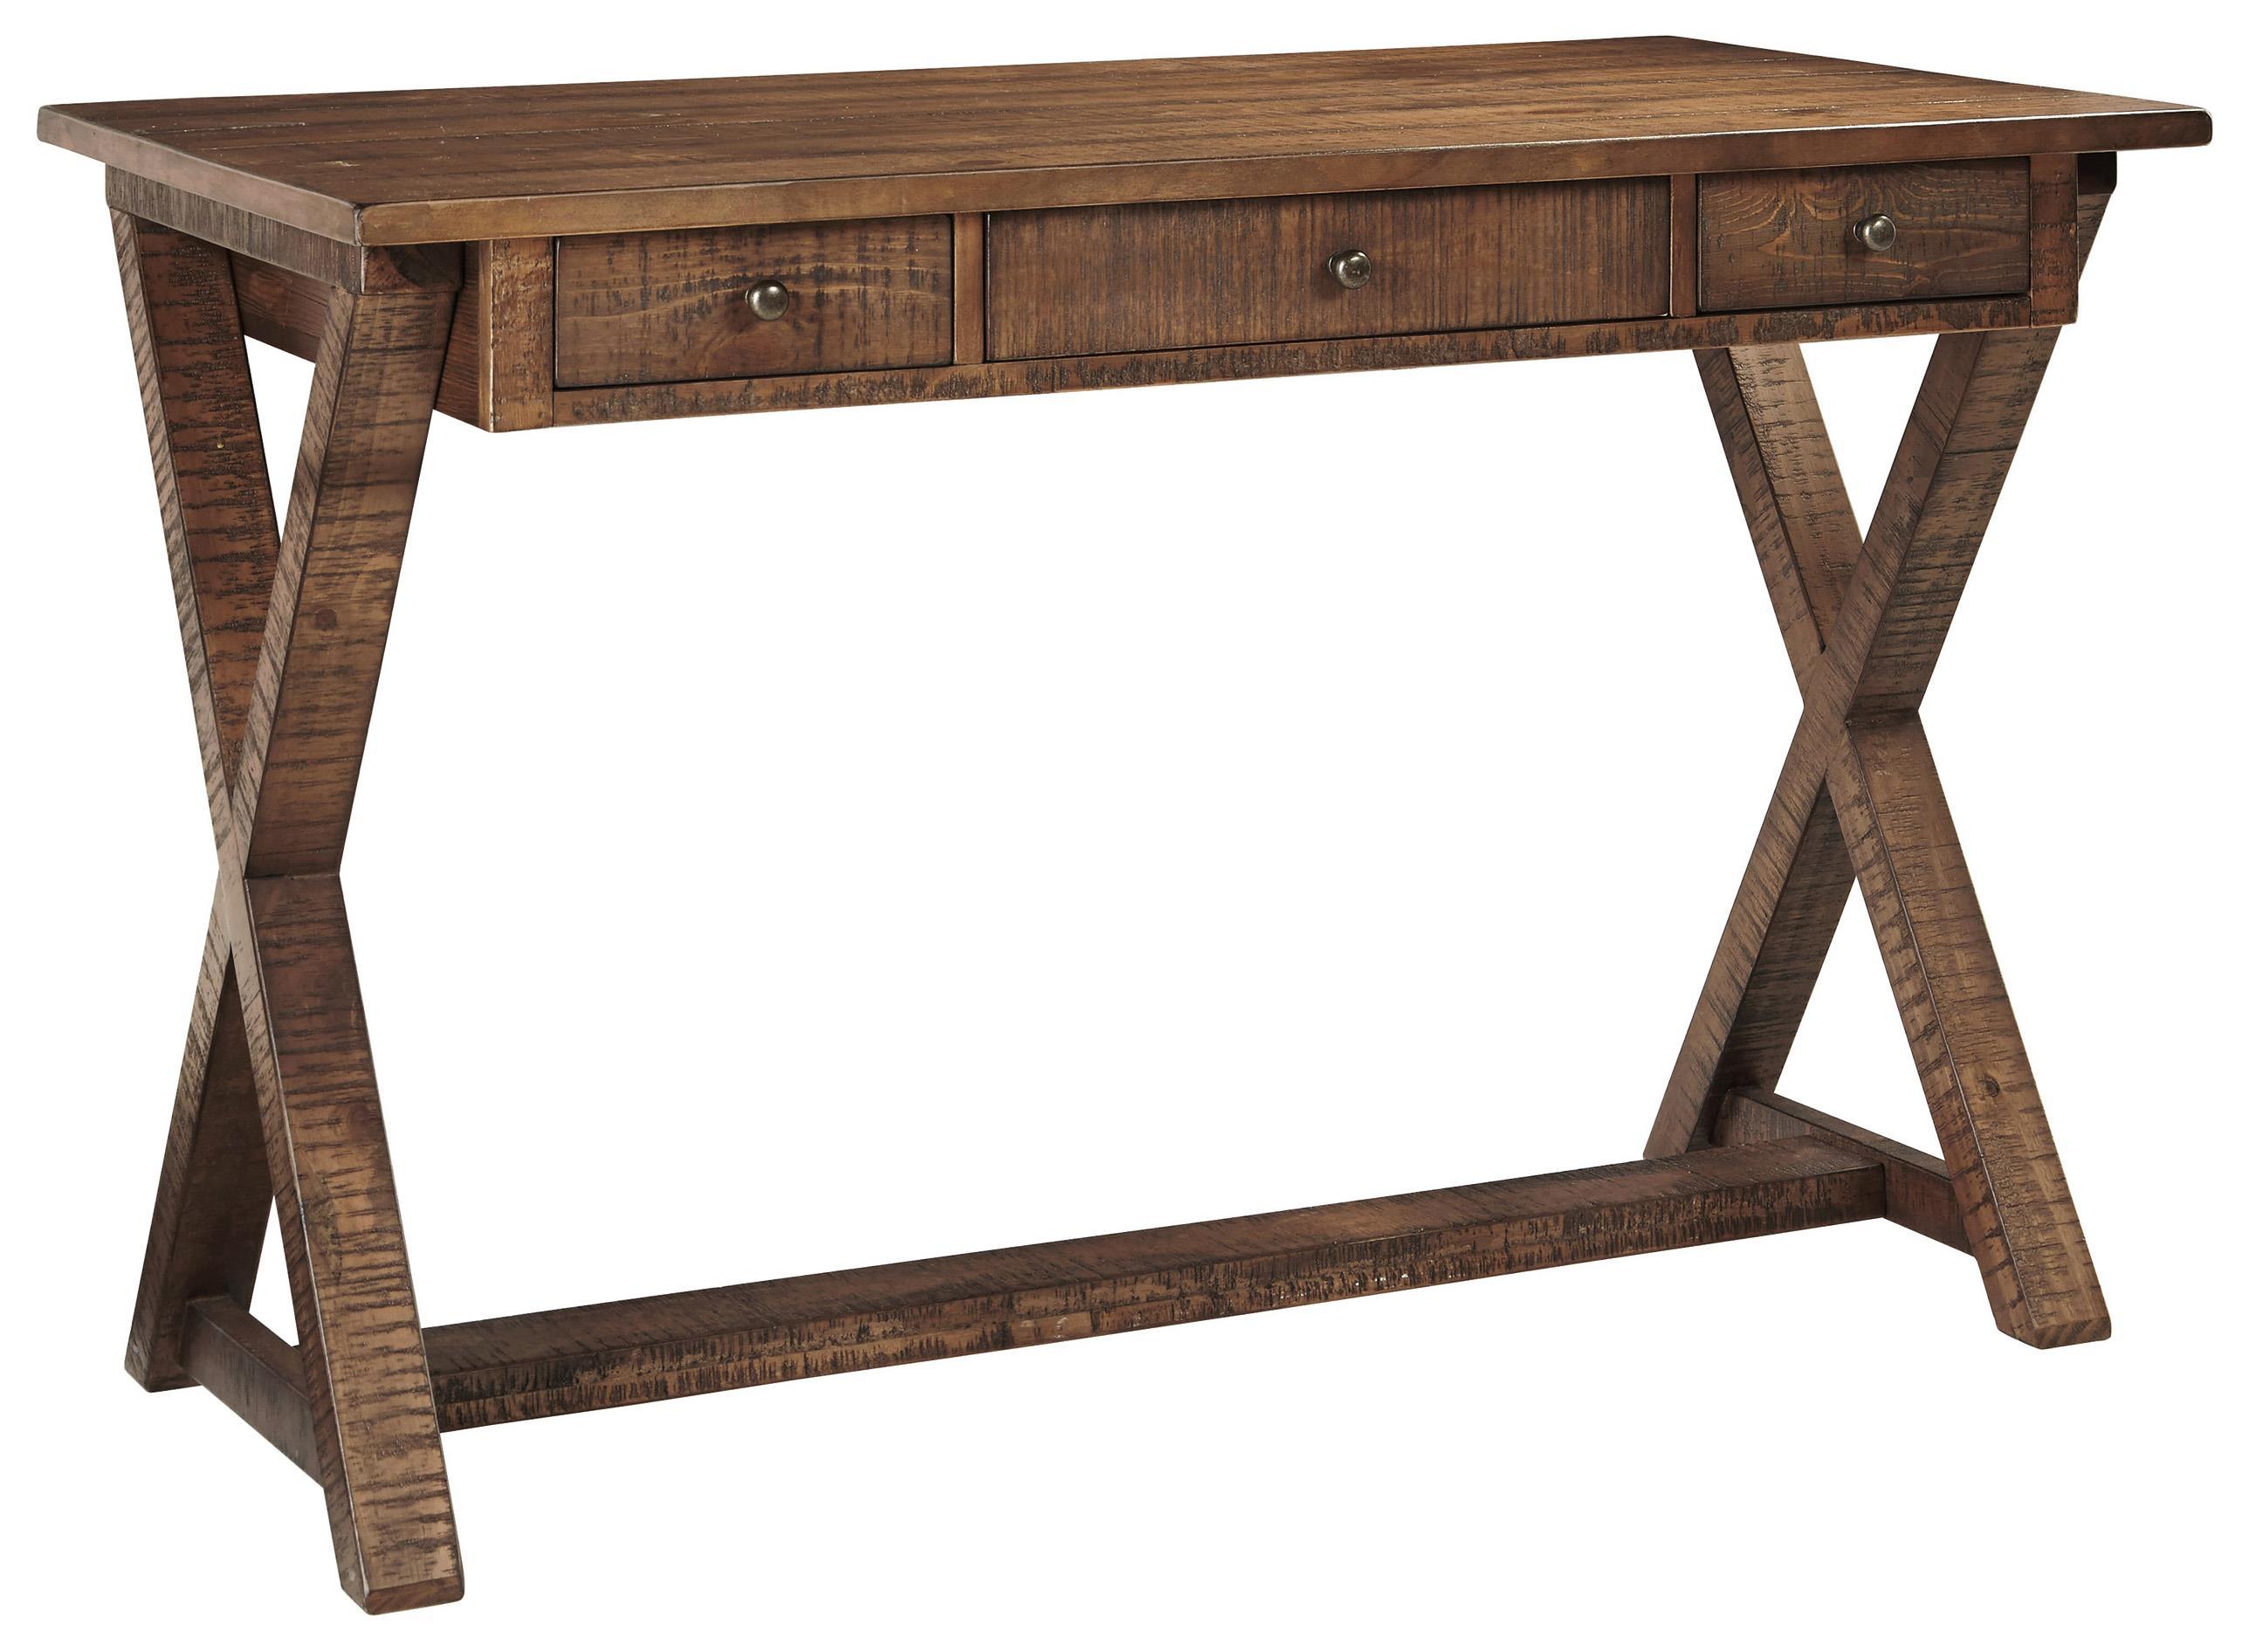 Signature Design by Ashley Minbreeze Home Office Large Leg Desk - Item Number: H588-11